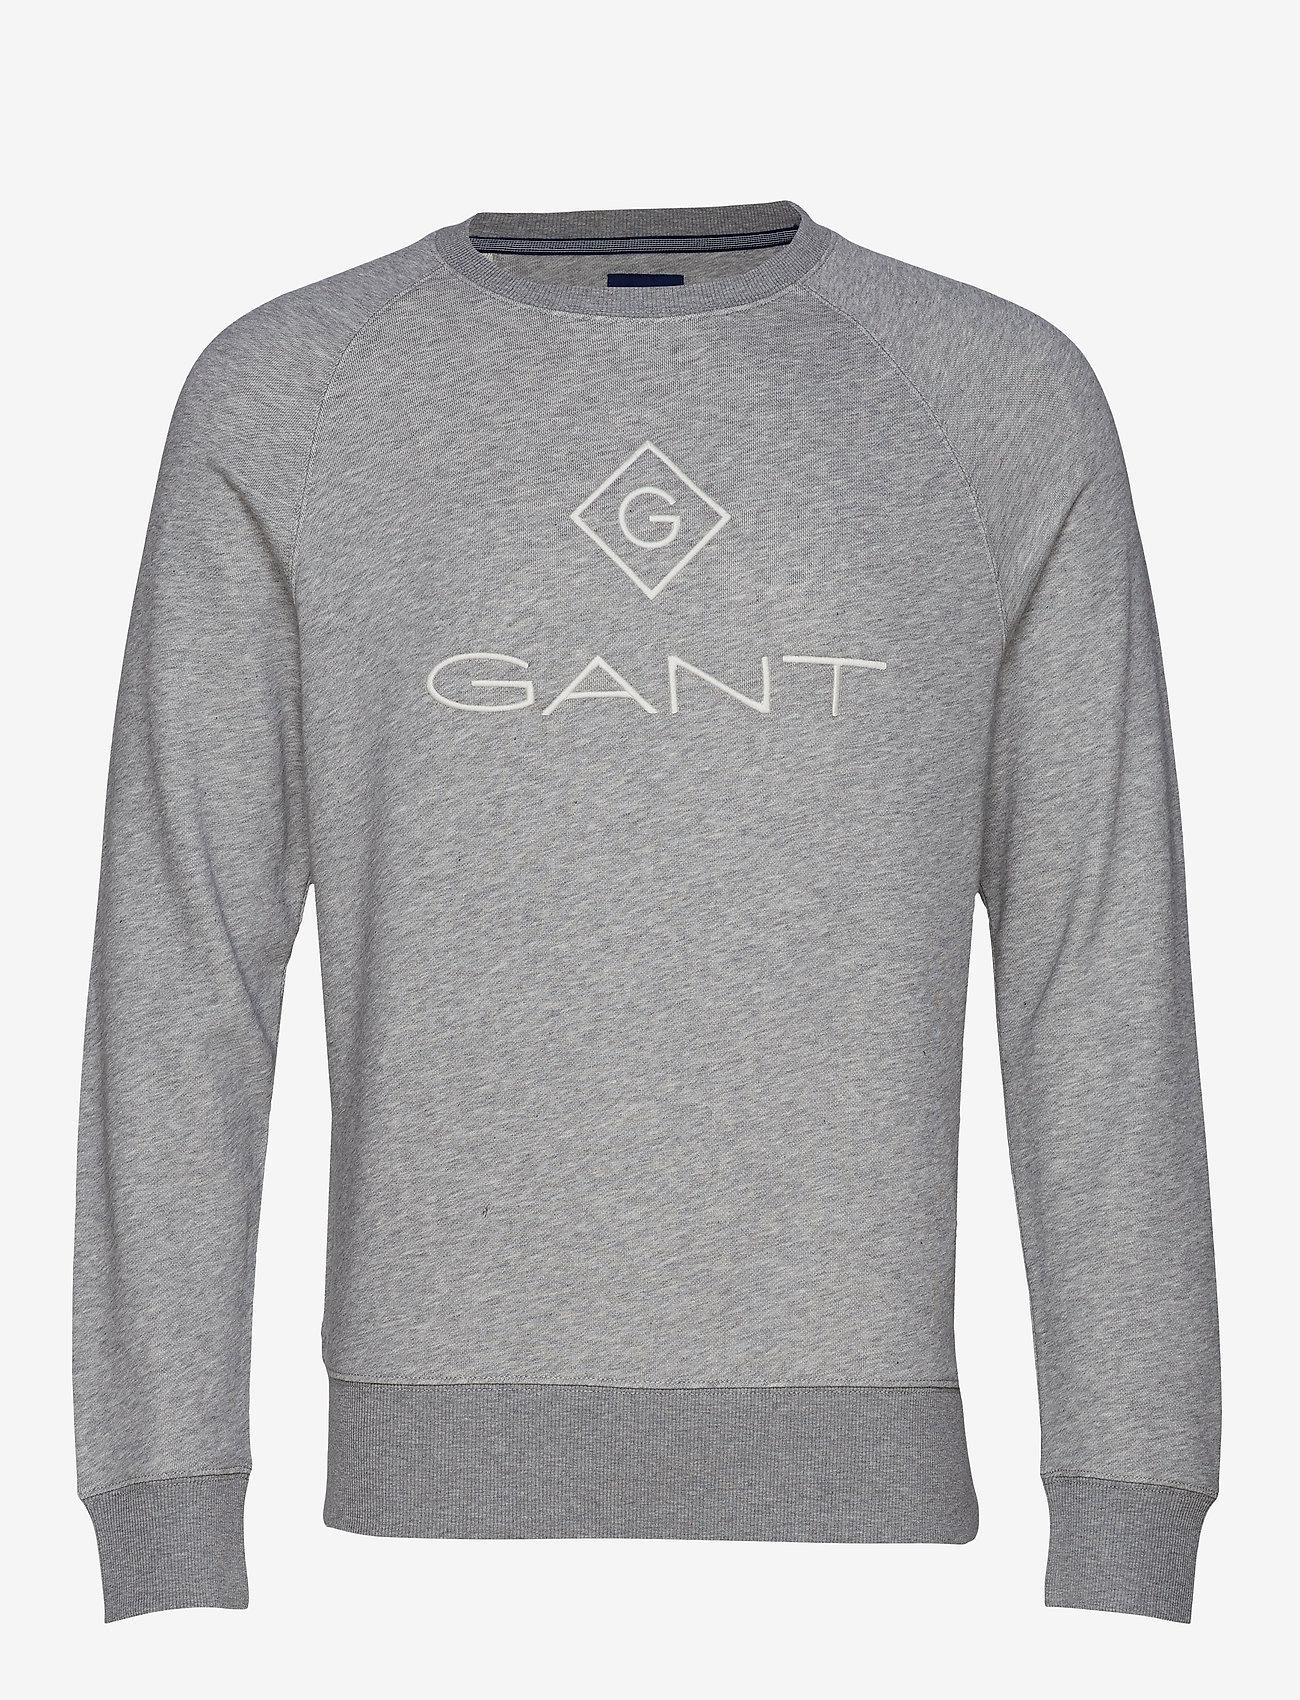 GANT - LOCK UP C - NECK SWEAT - oberteile - grey melange - 0